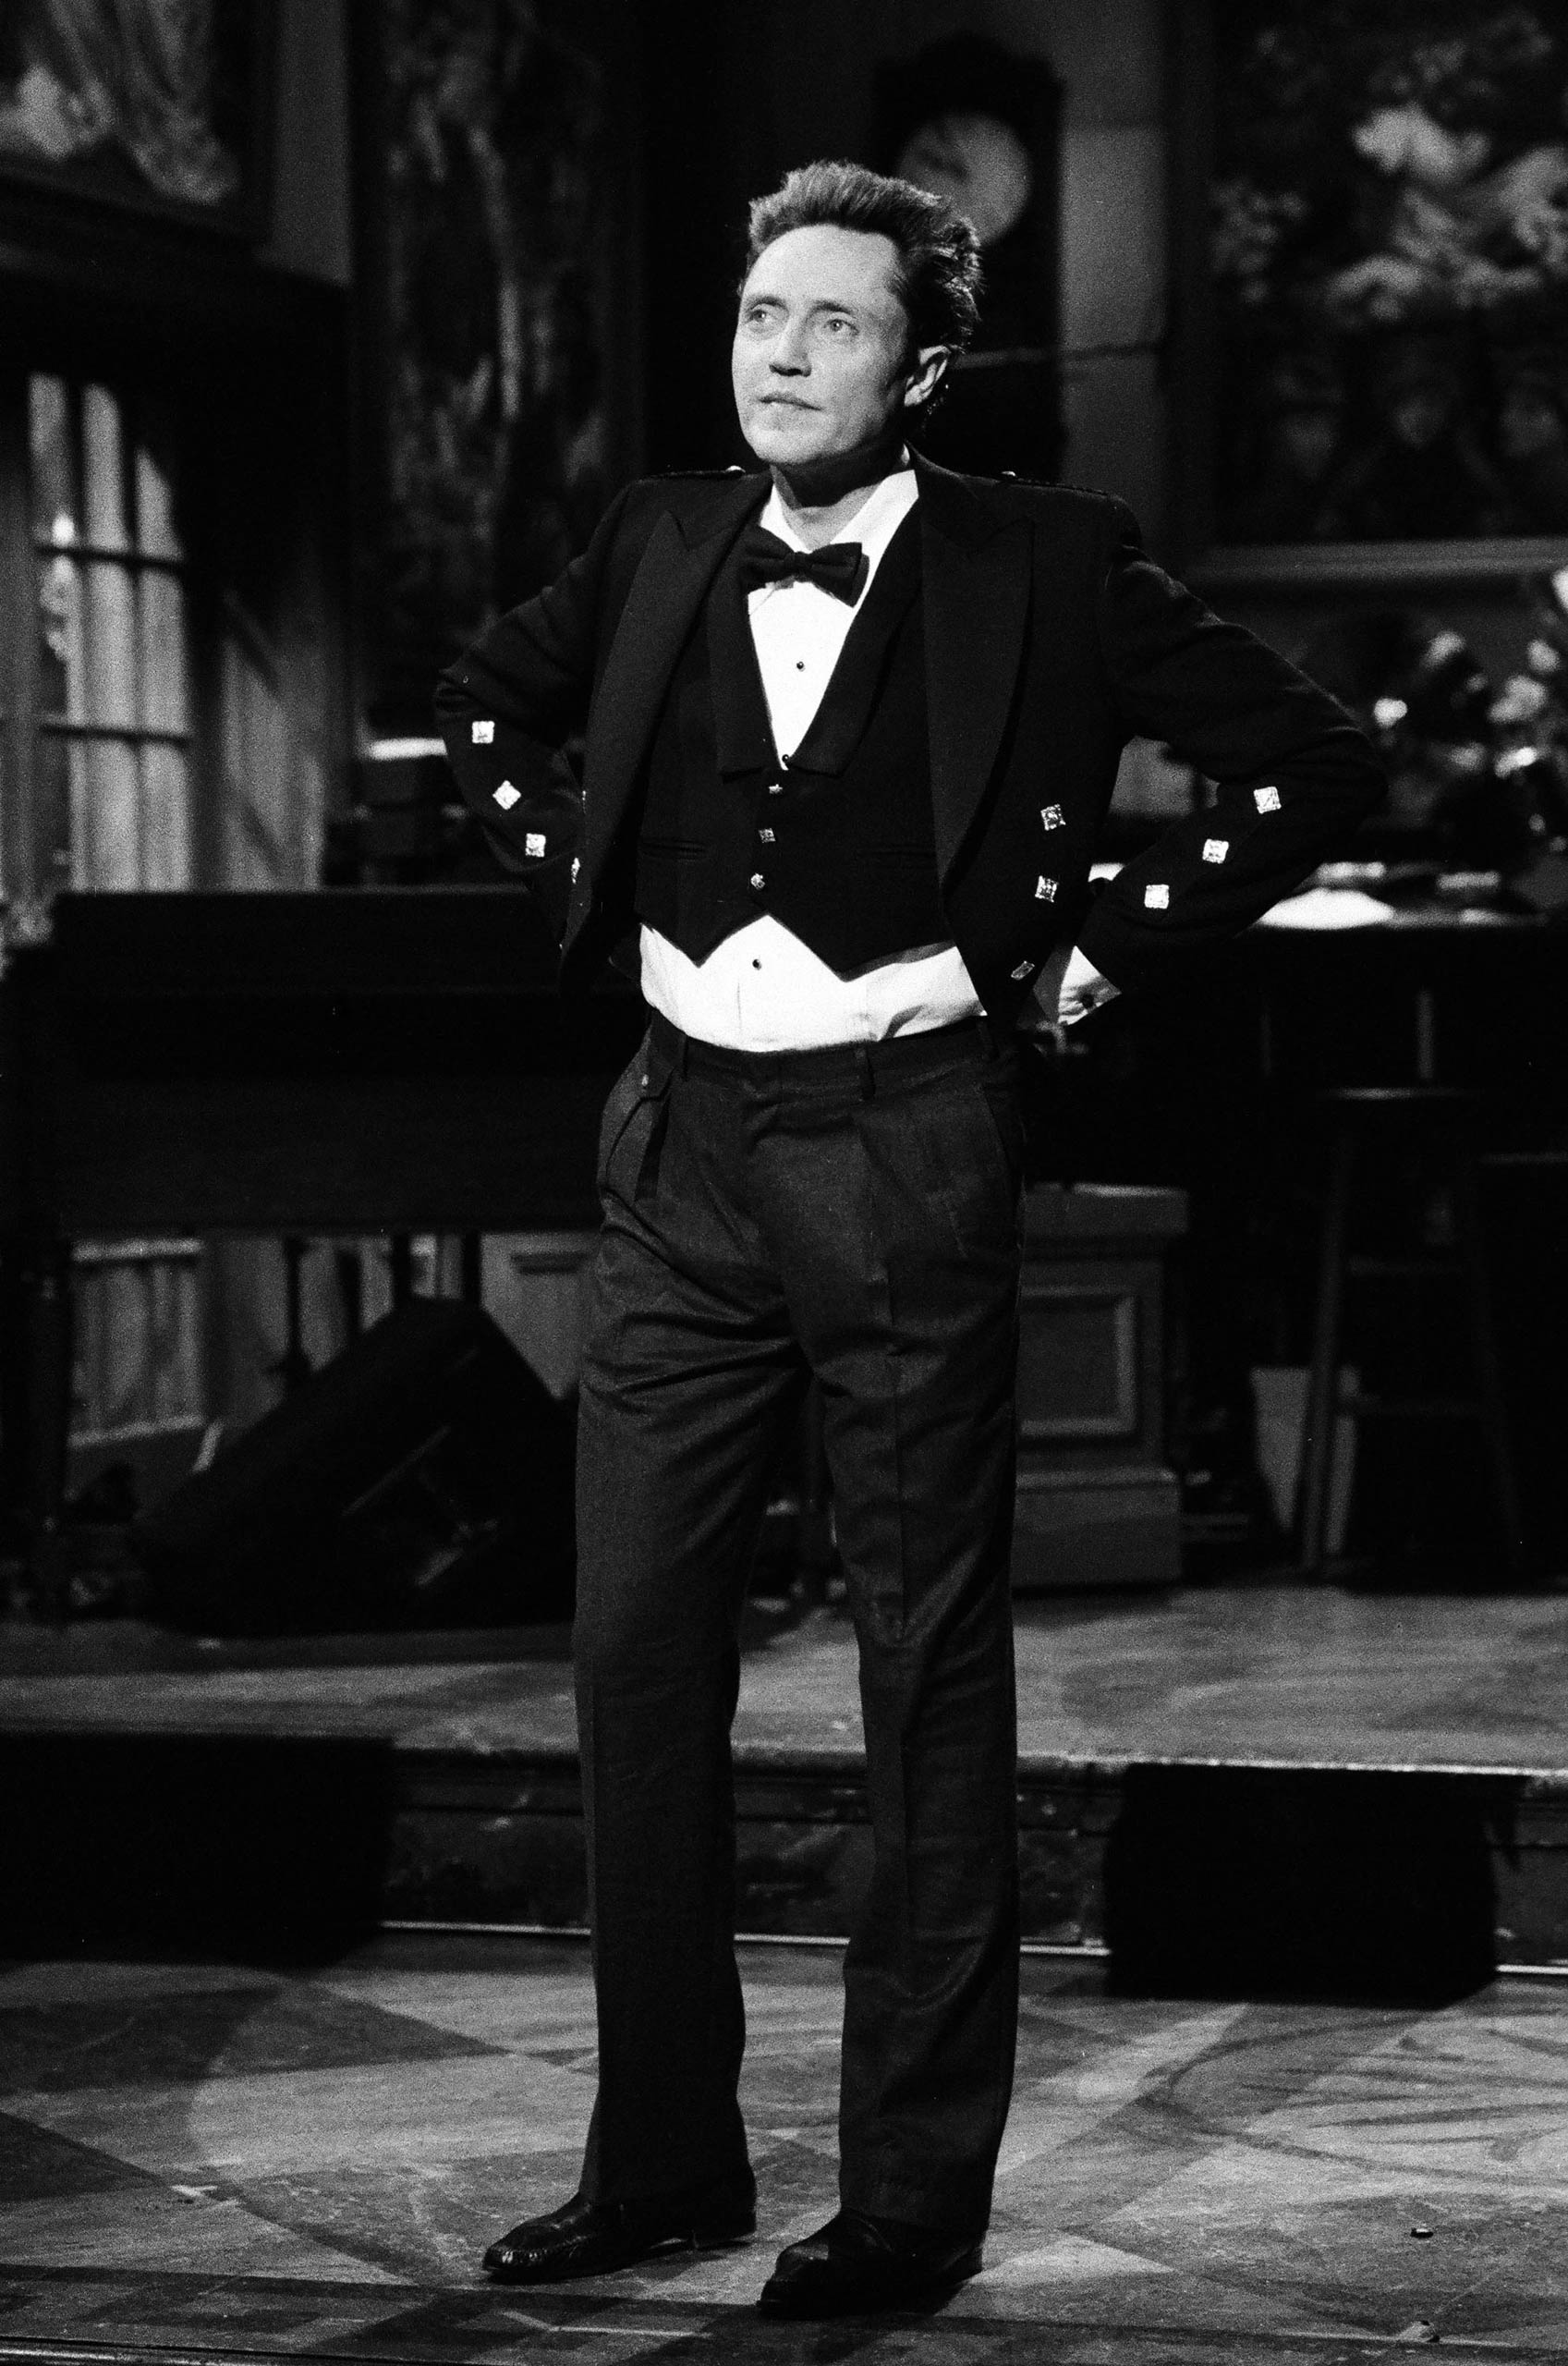 Saturday Night Live - Seasn 15